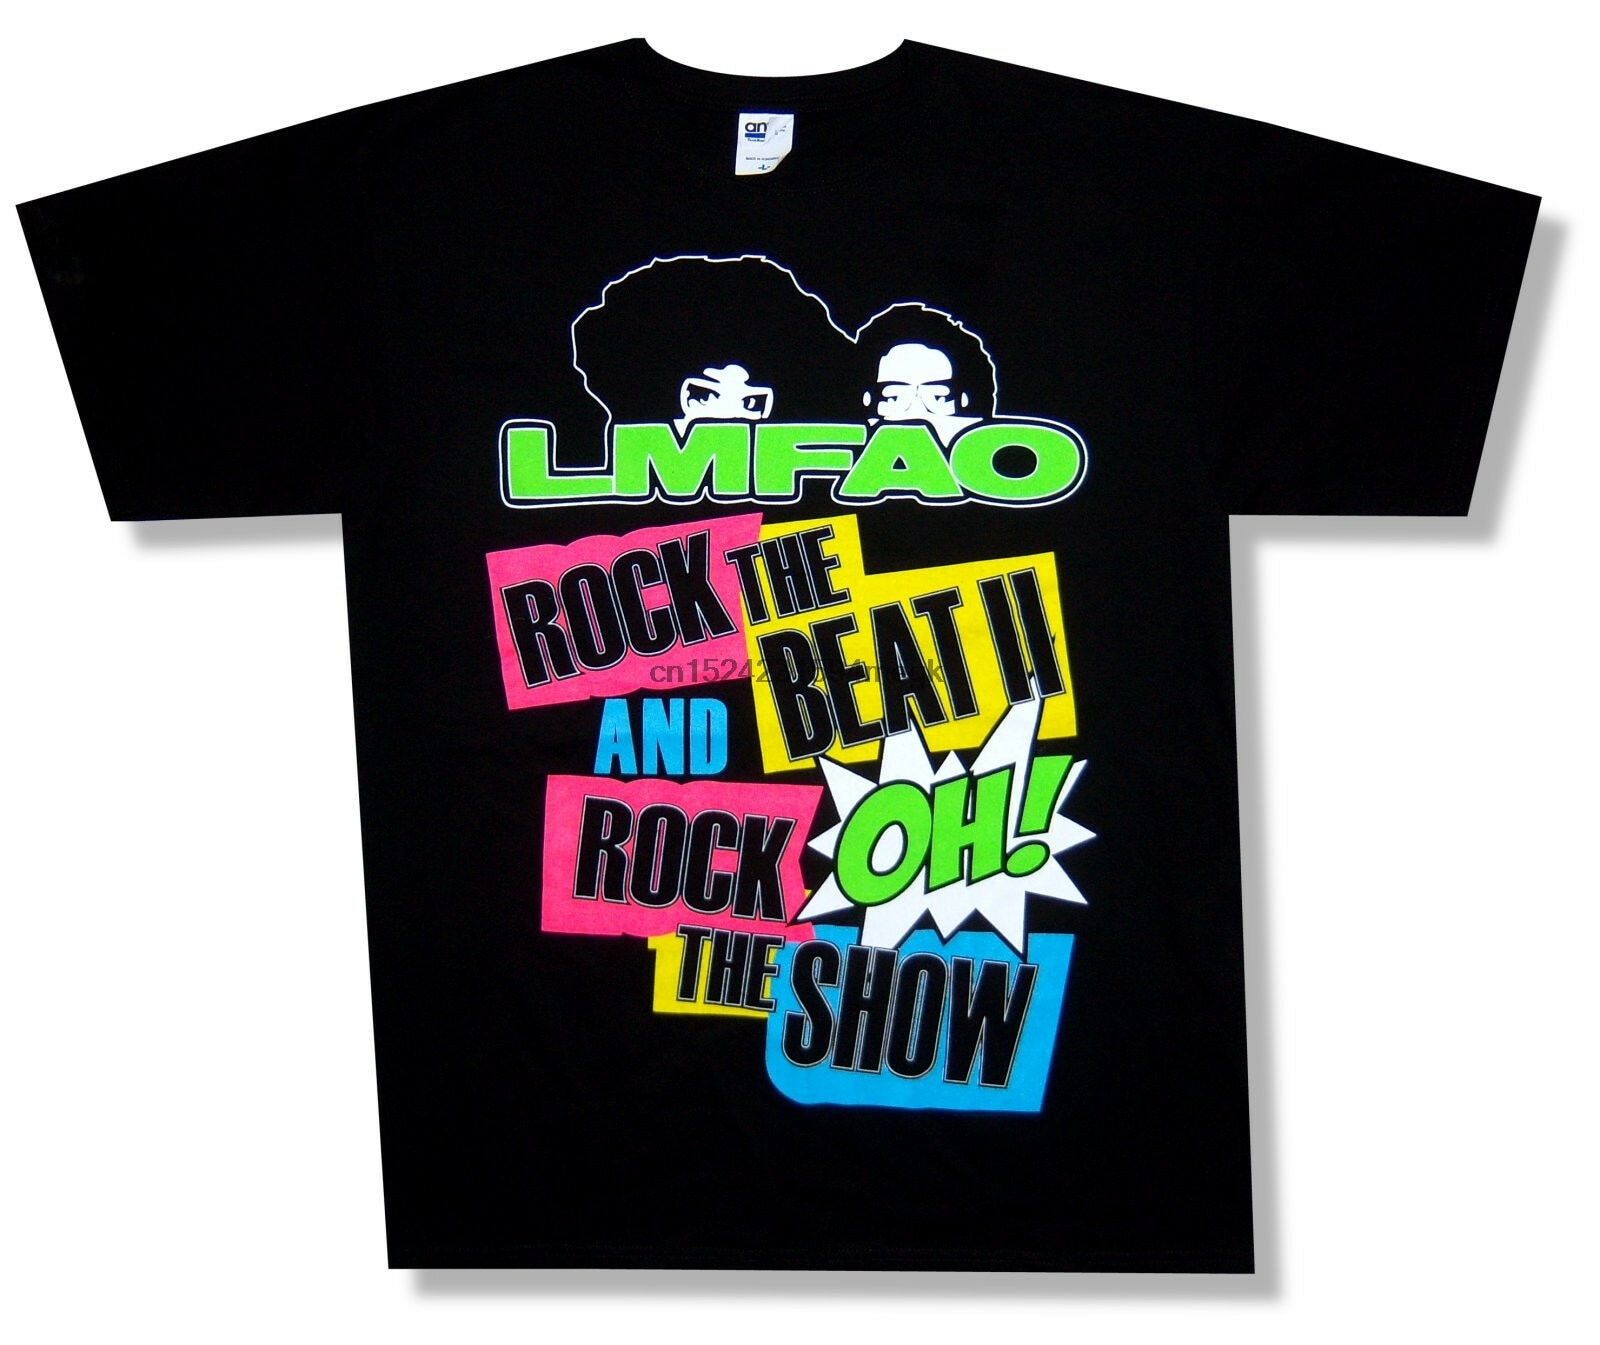 Camiseta negra LMFAO ROCK THE BEAT ROCK THE SHOW para adulto nuevo oficial (1)